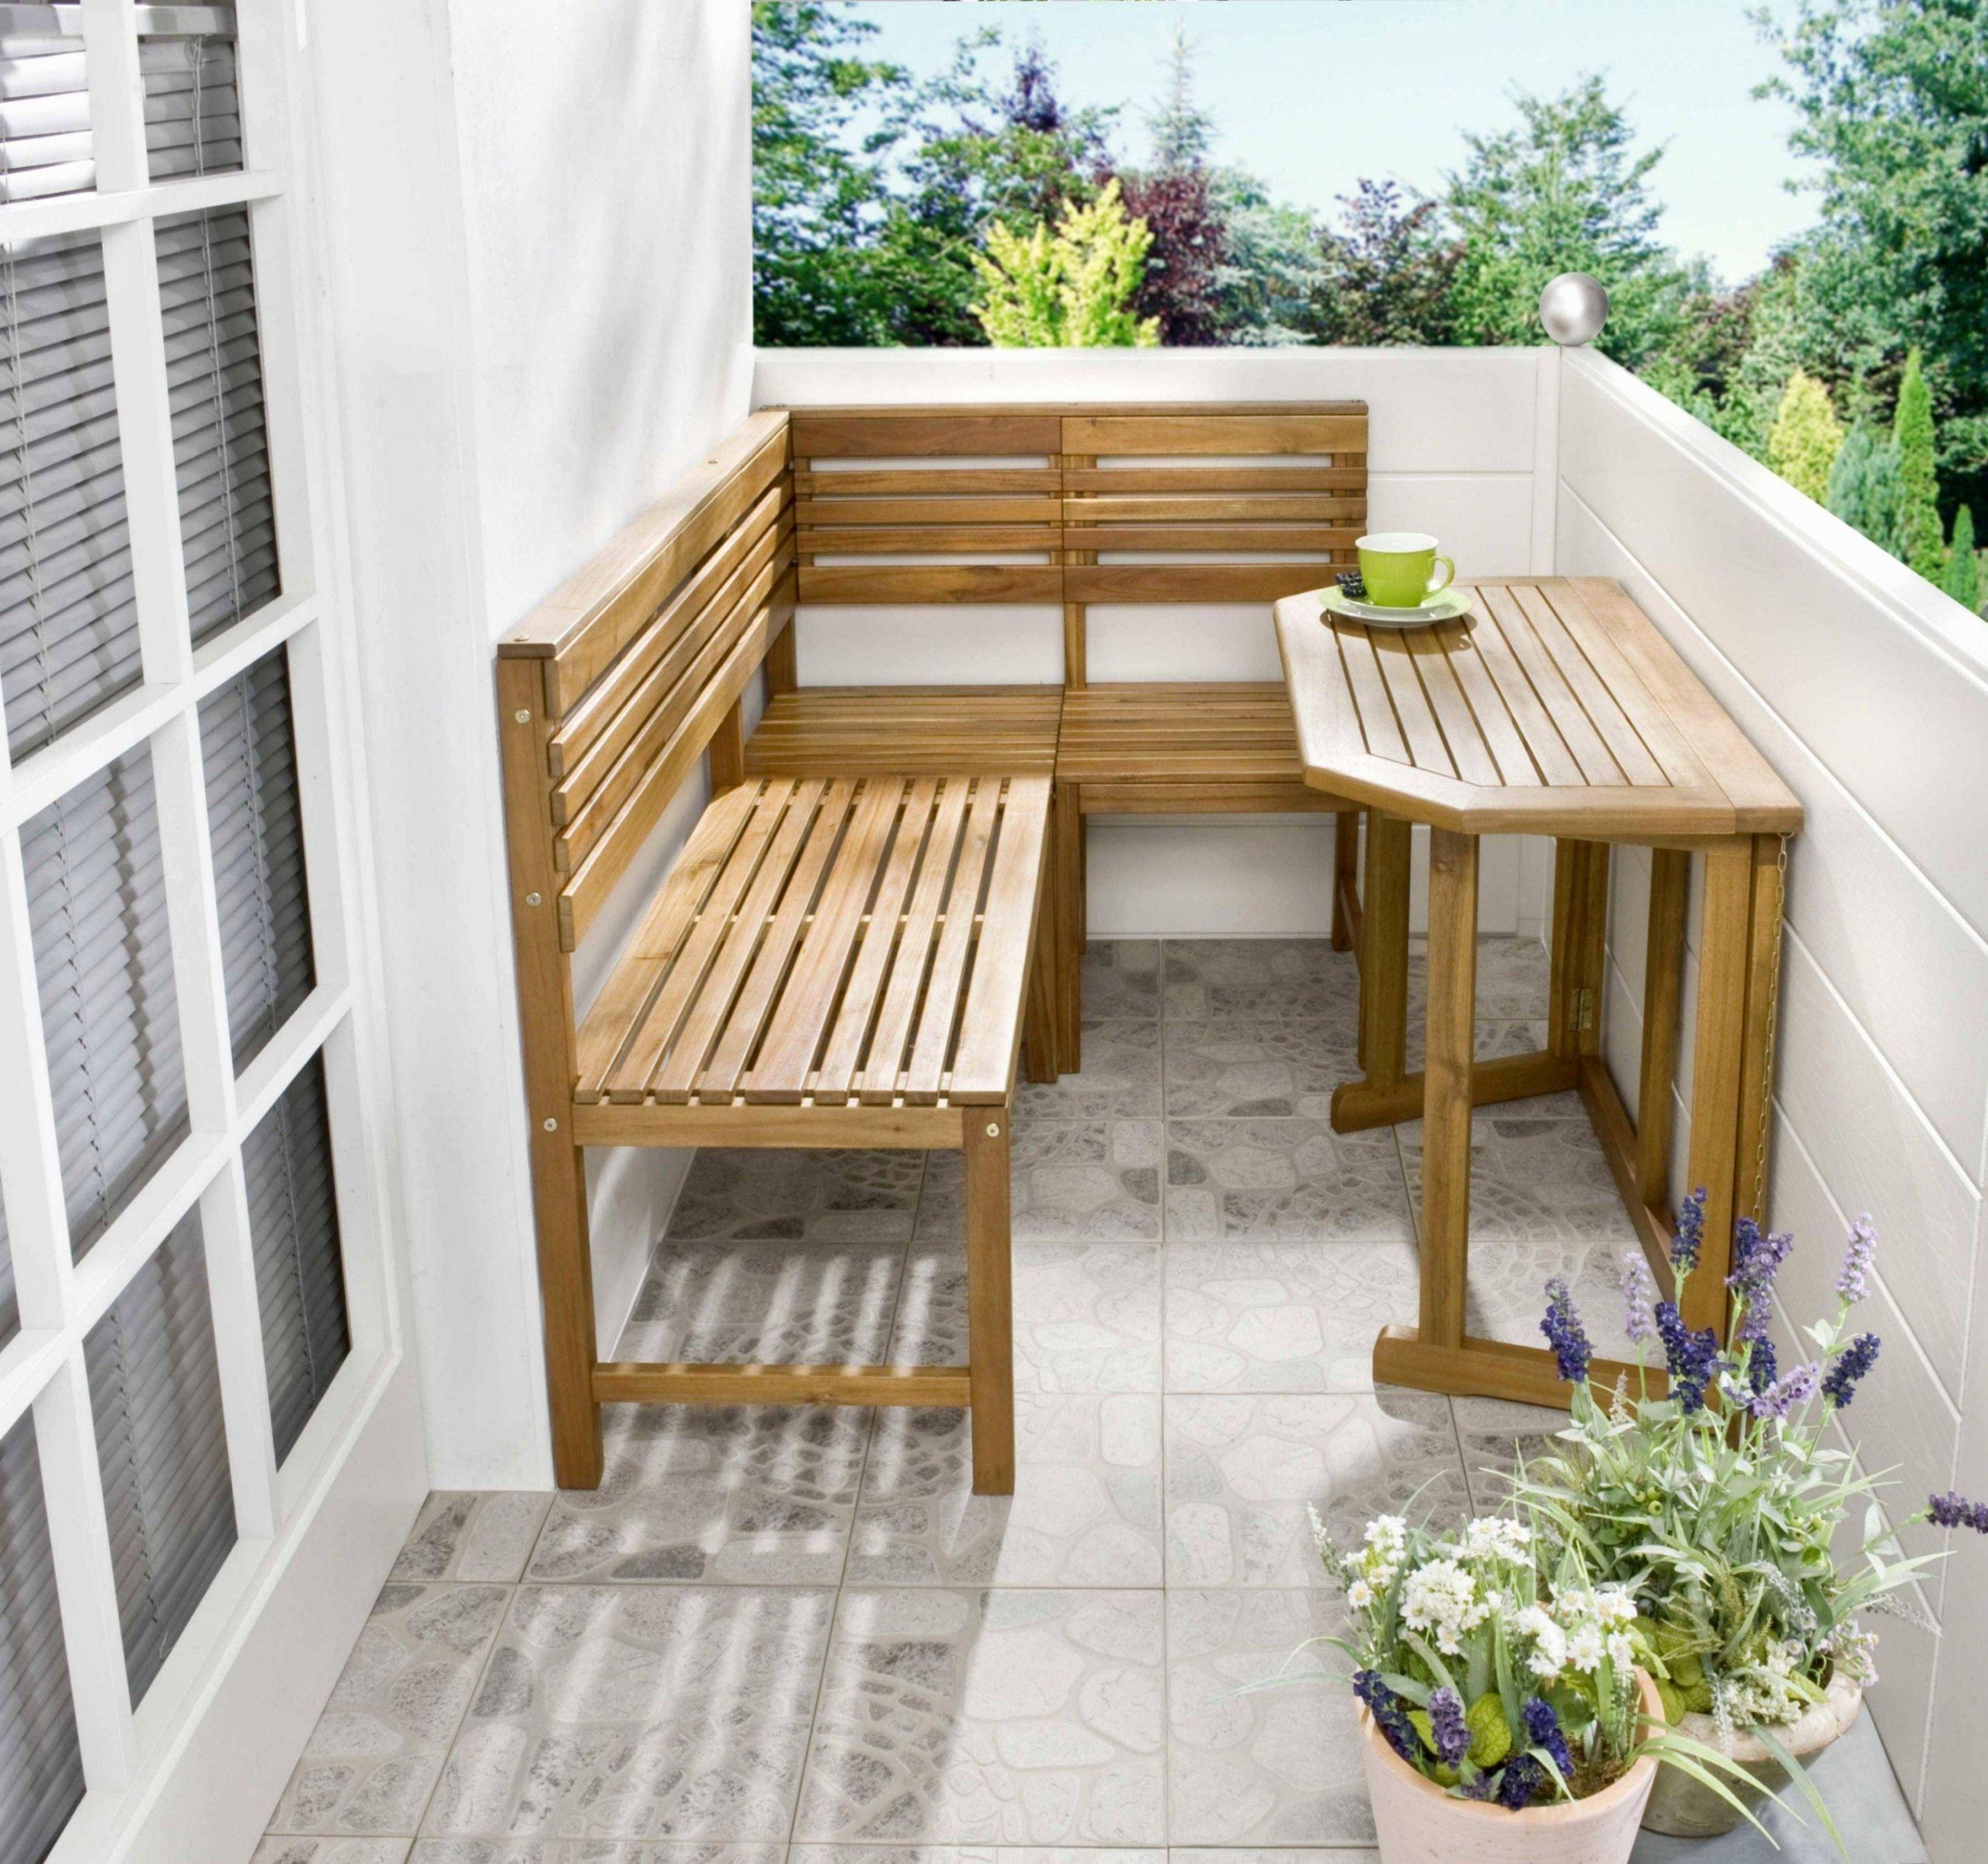 balkonmobel kleiner balkon yct projekte ideen fur kleinen balkon ideen fur kleinen balkon